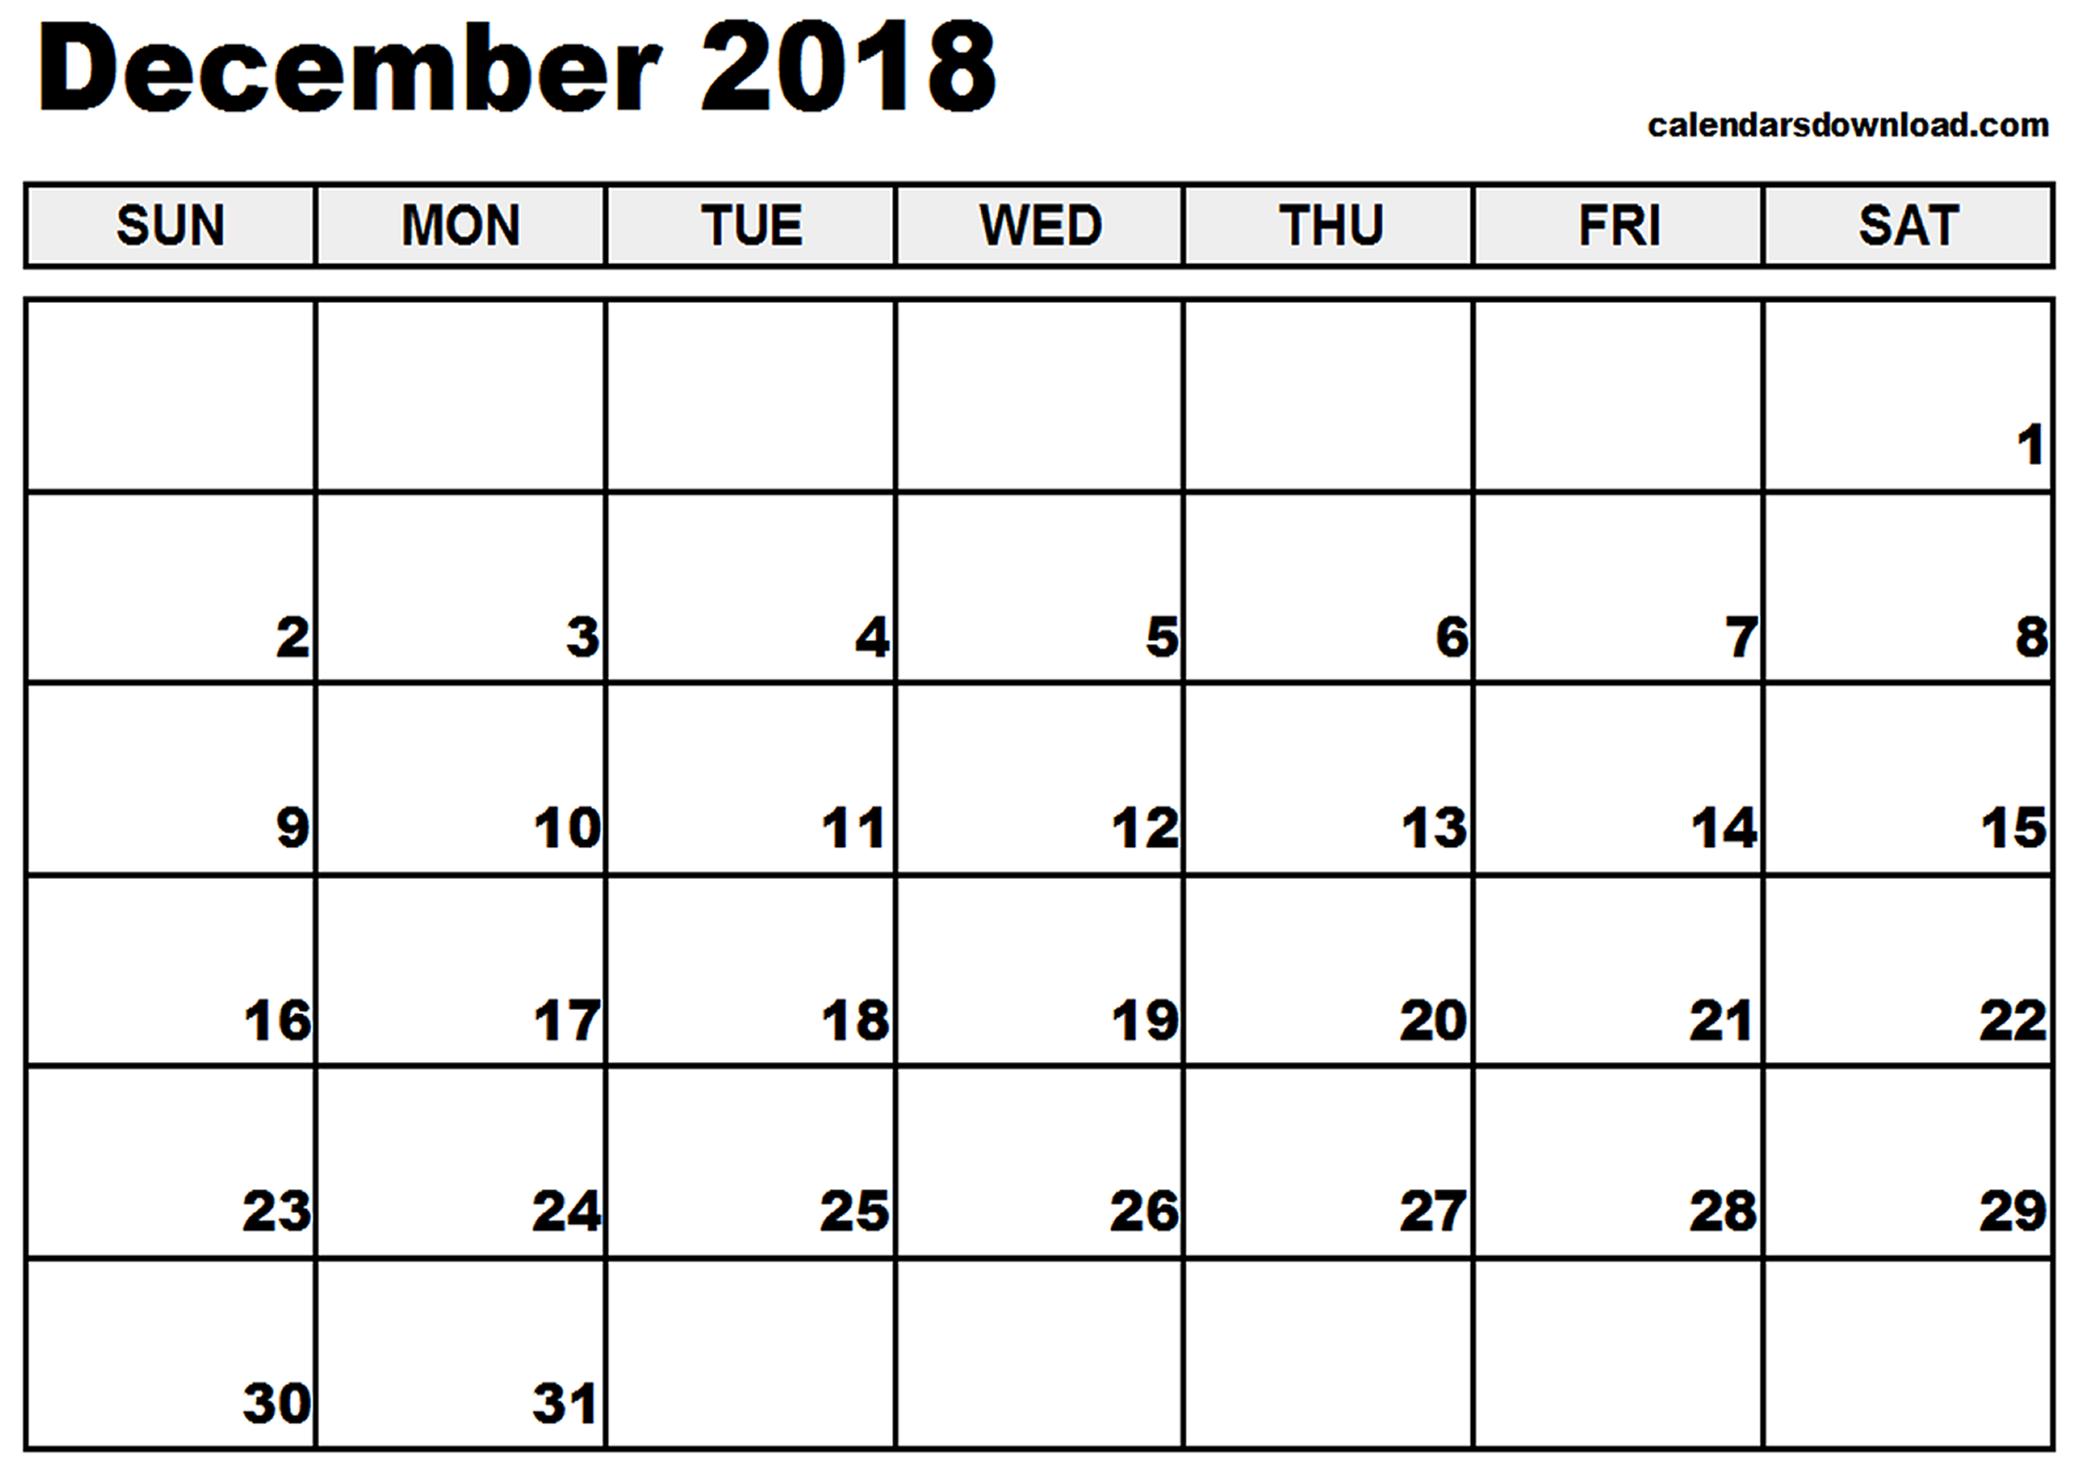 December 2018 Printable Calendar | 2018 calendar printable